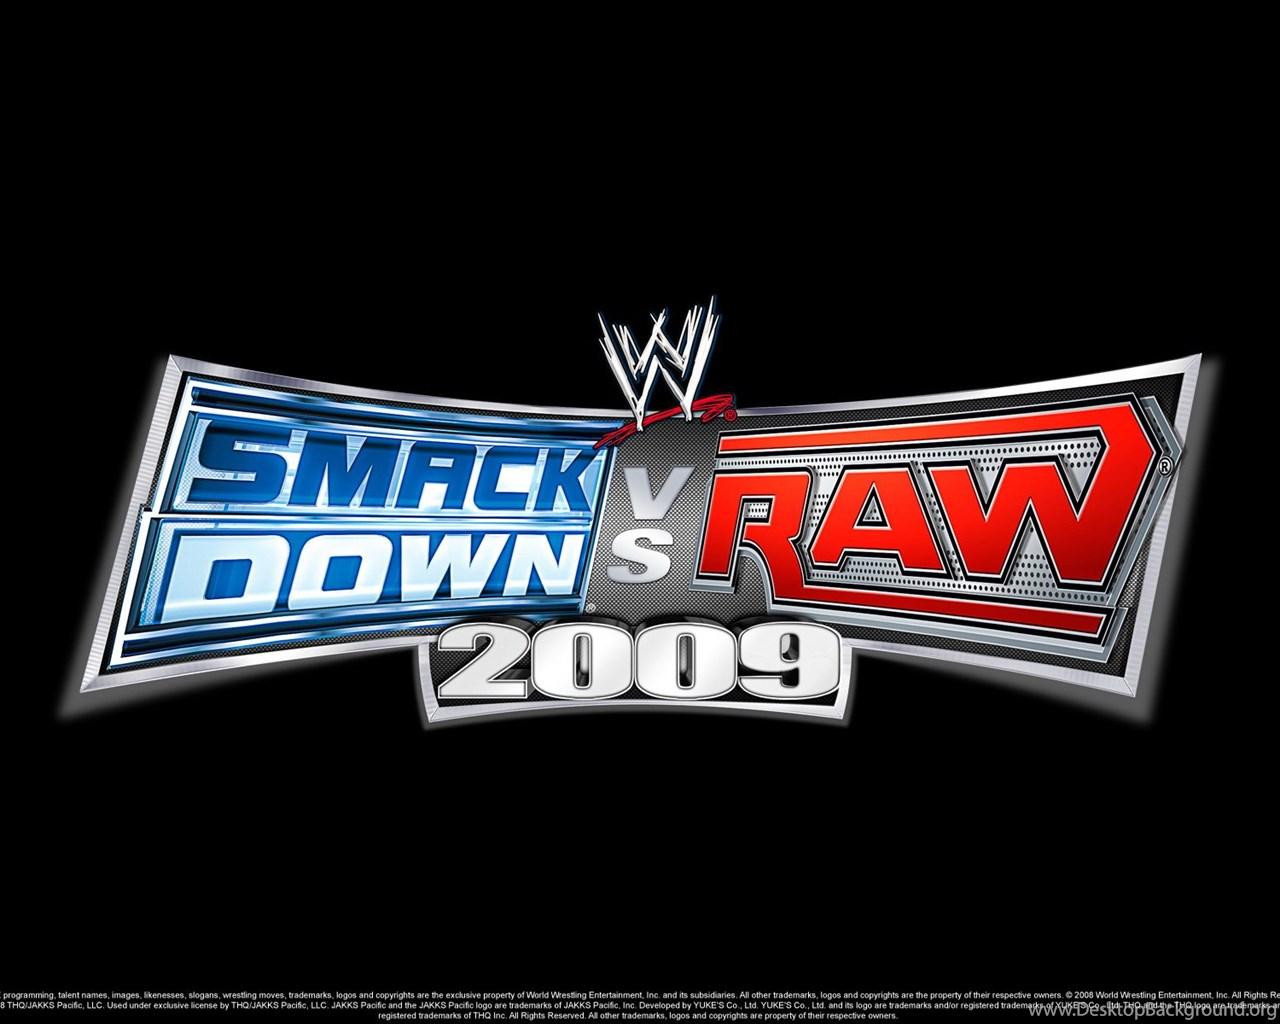 Wwe Smackdown Raw Wallpapers The Rock 3 Desktop Background